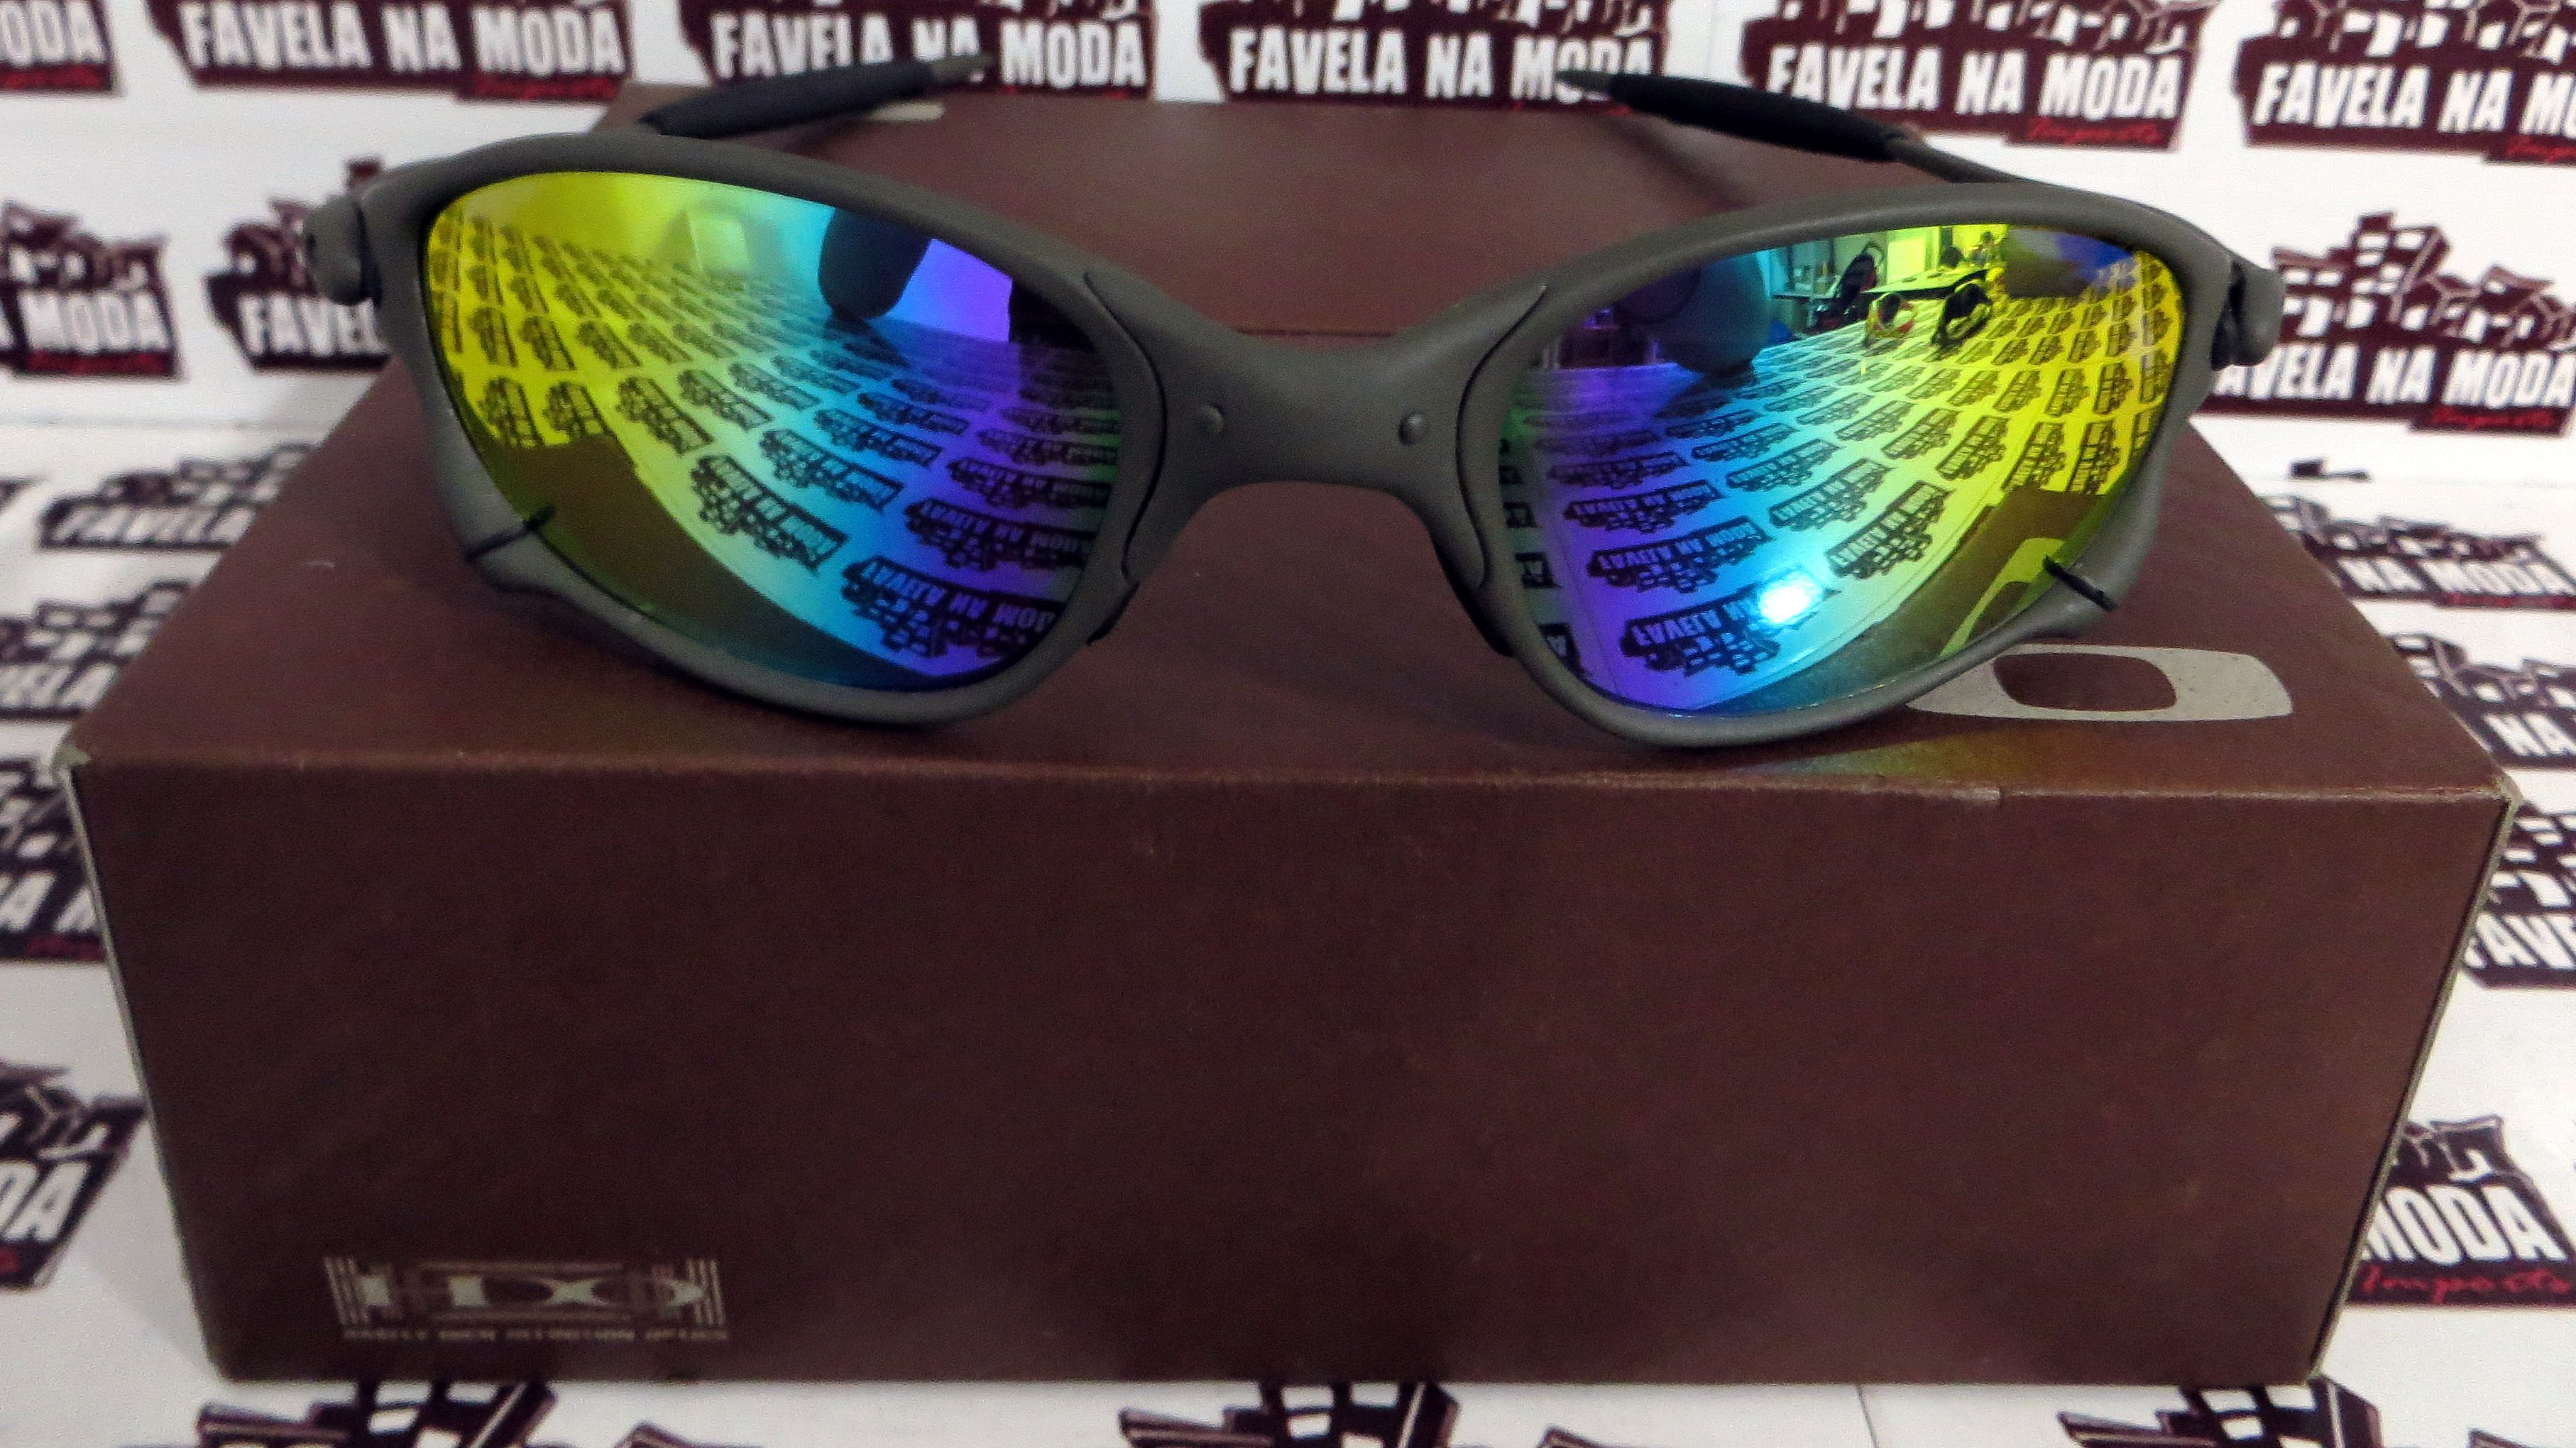 44873a116 Óculos Oakley Double xx / X-Metal / Arco Íris / Borrachas Pretas